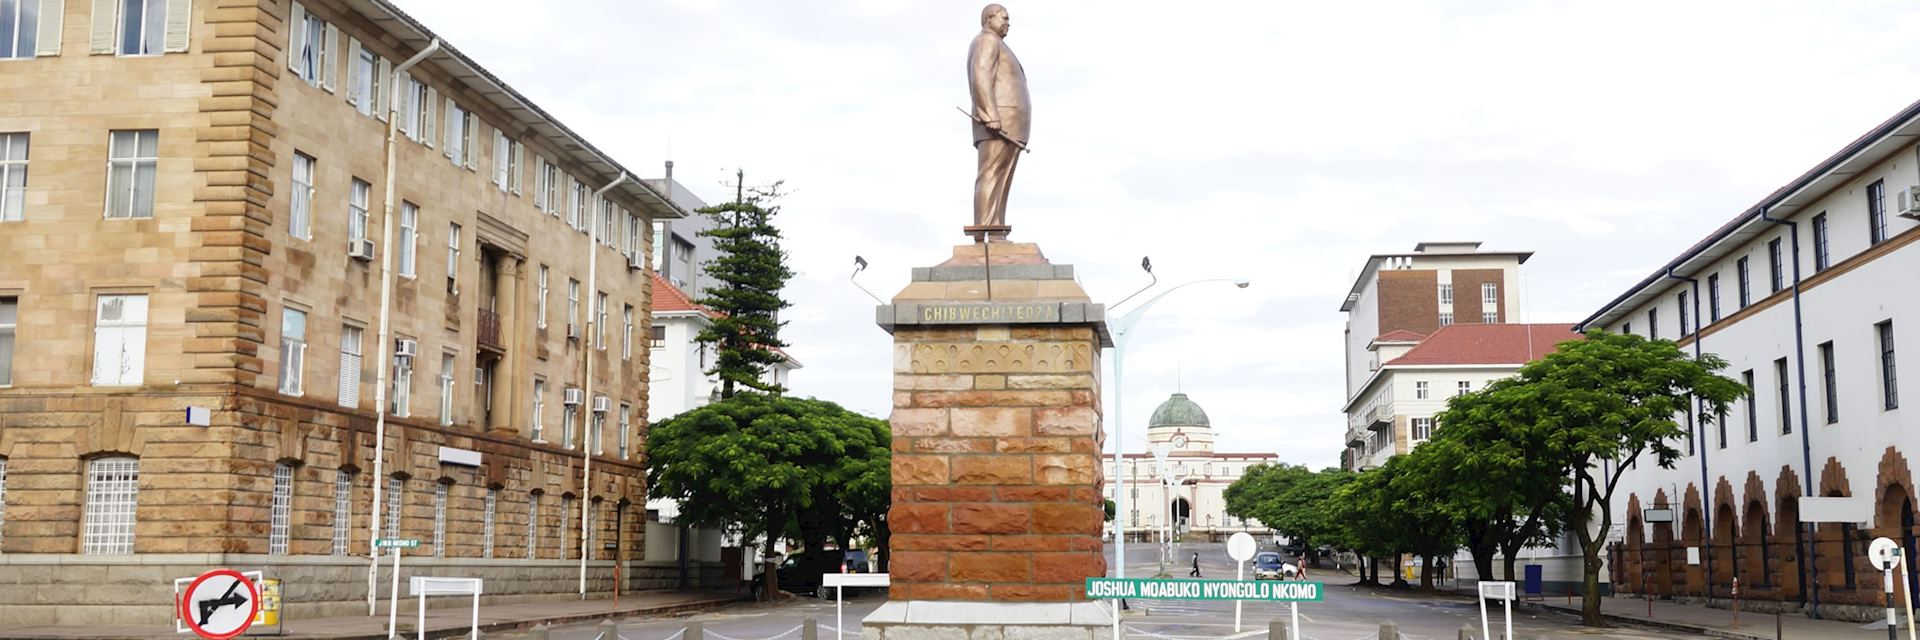 Bulawayo City